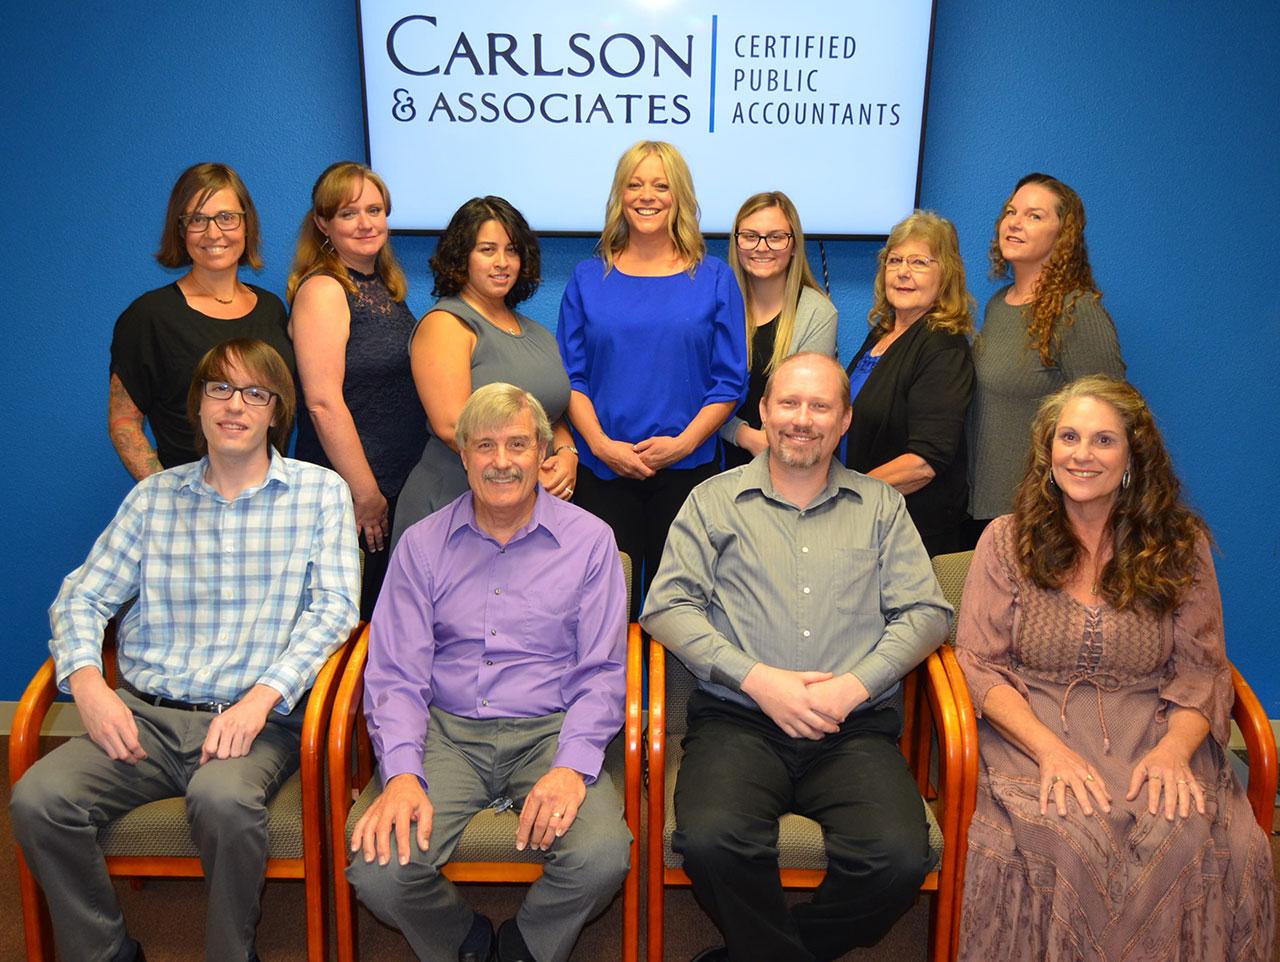 The Carlson & Associates Certified Public Accountants Team!